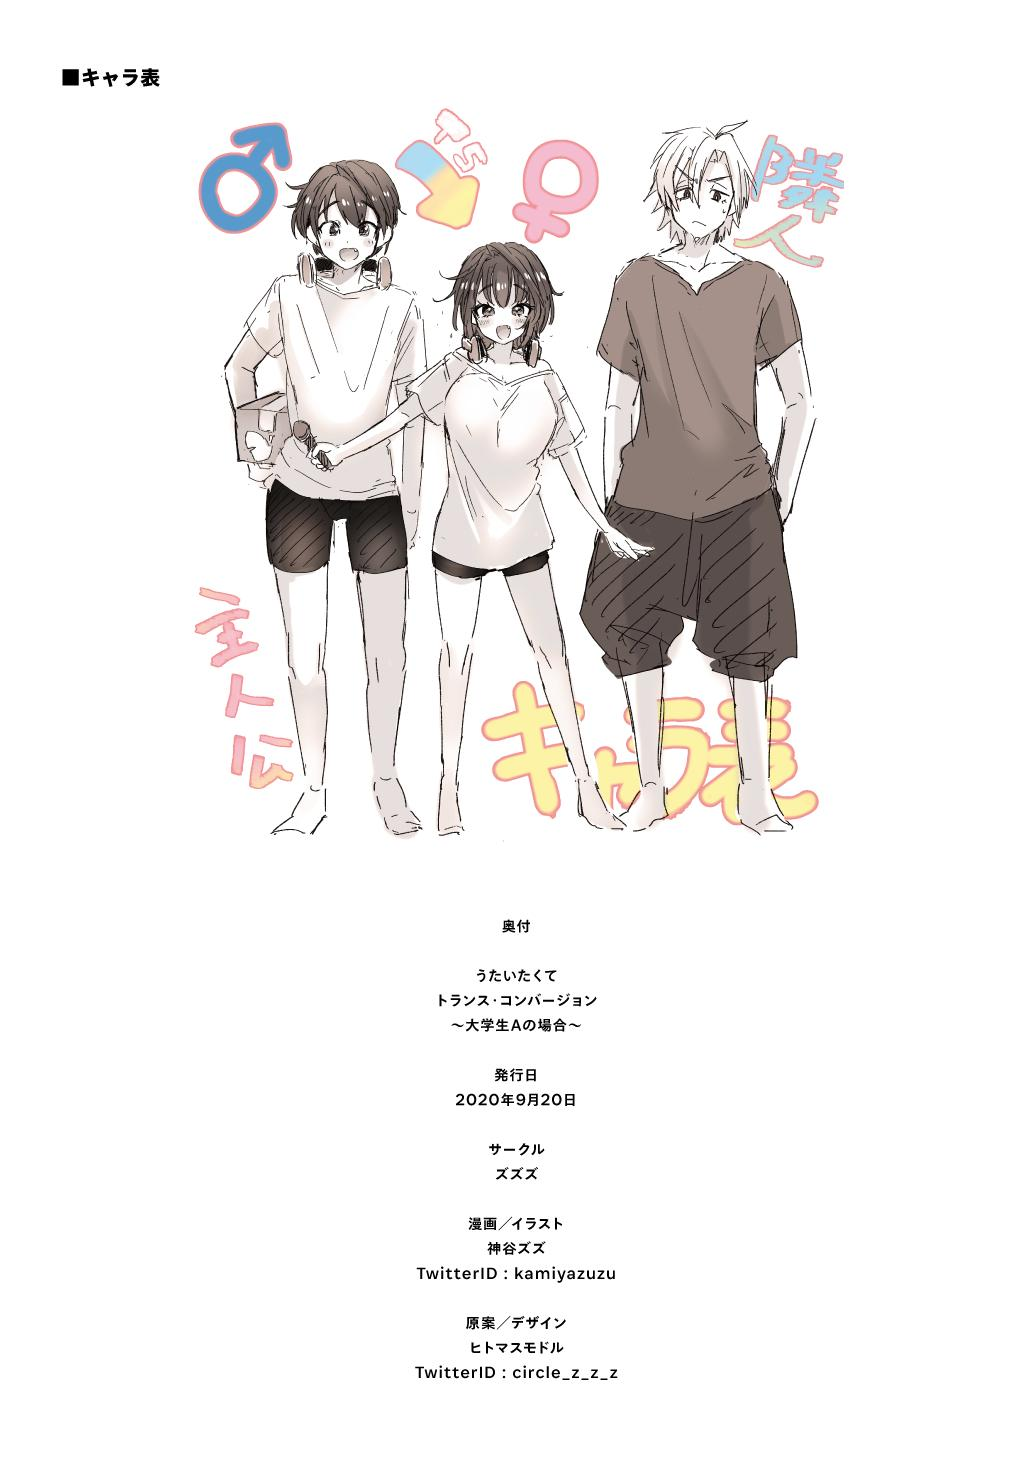 "[ZUZUZU (Kamiya Zuzu)] Utai Tekute ~Trans Conversion ""Daigakusei A no Baai""~ | I Wanted to Sing ~ Trans Conversion ""The Case of College Student A""~ [English] [WisdomWapiti] [Digital] 38"